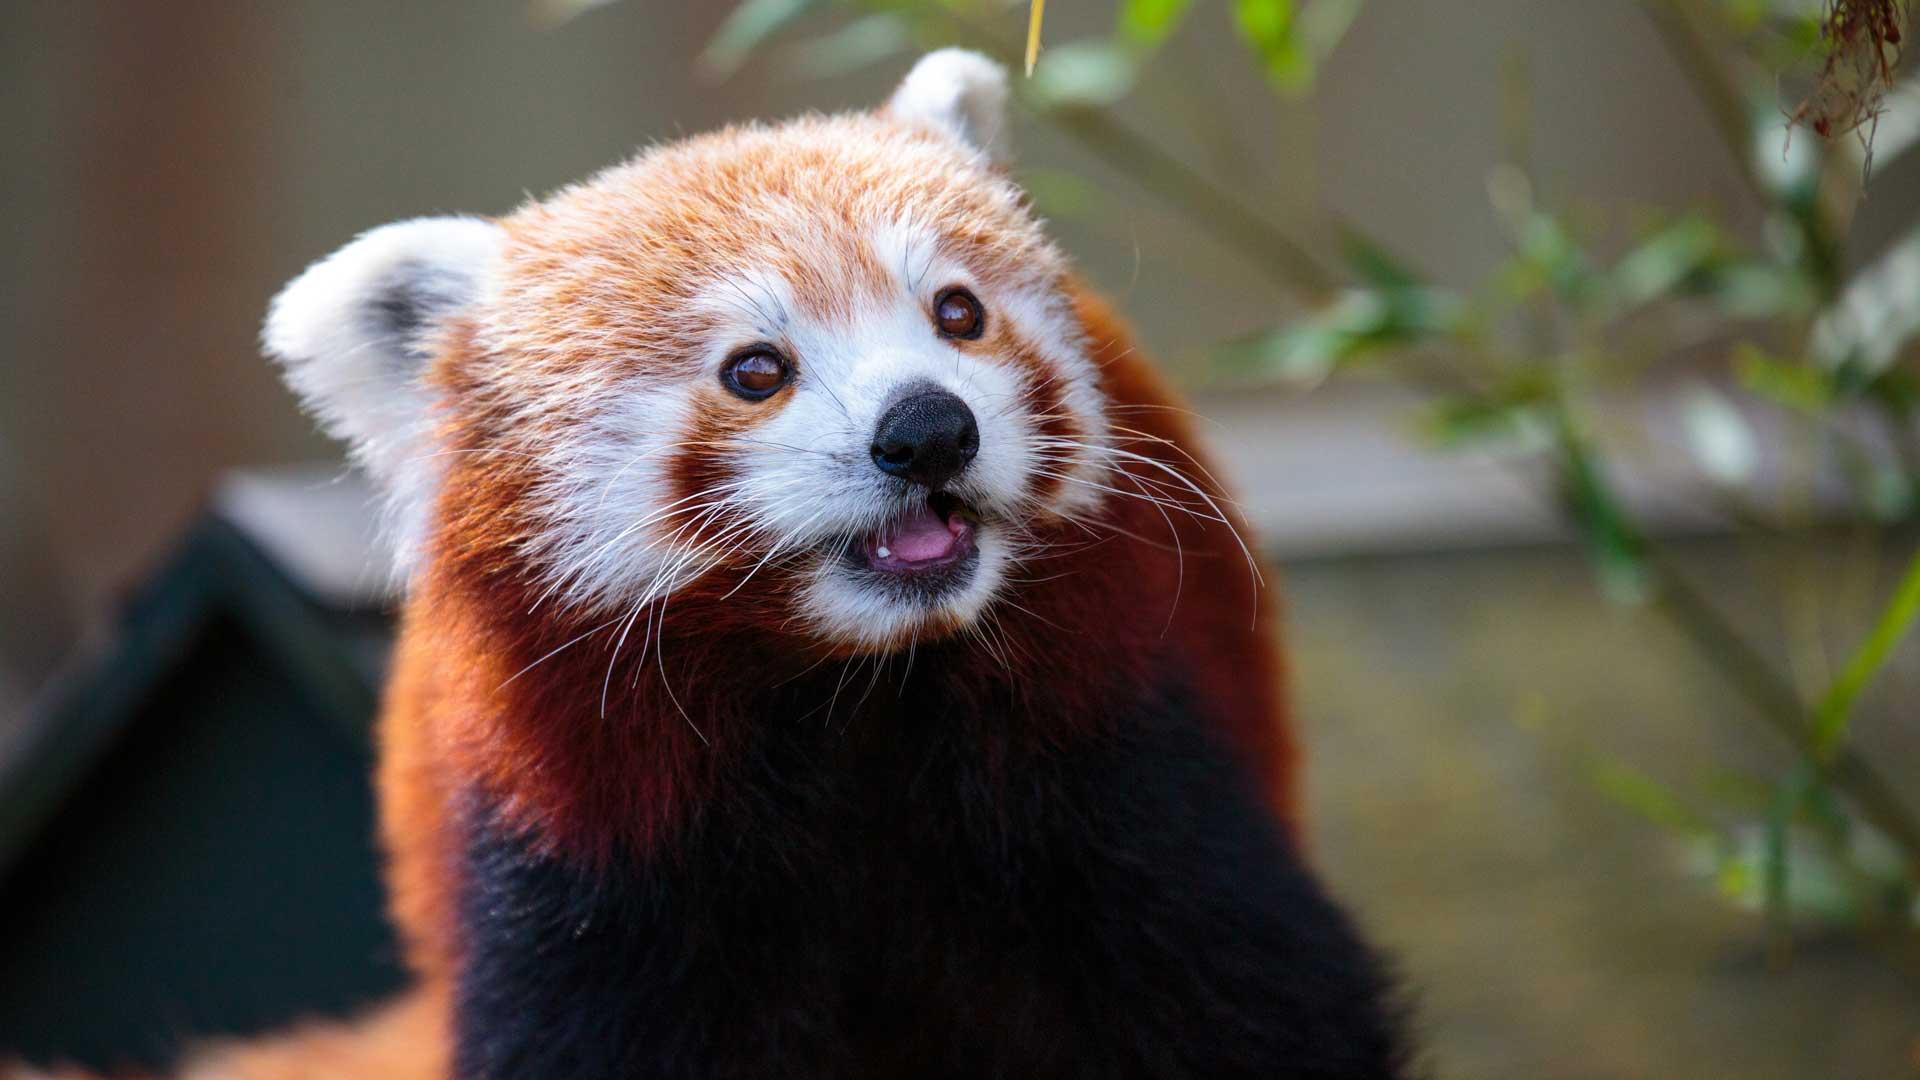 https://rfacdn.nz/zoo/assets/media/red-panda-gallery-4.jpg